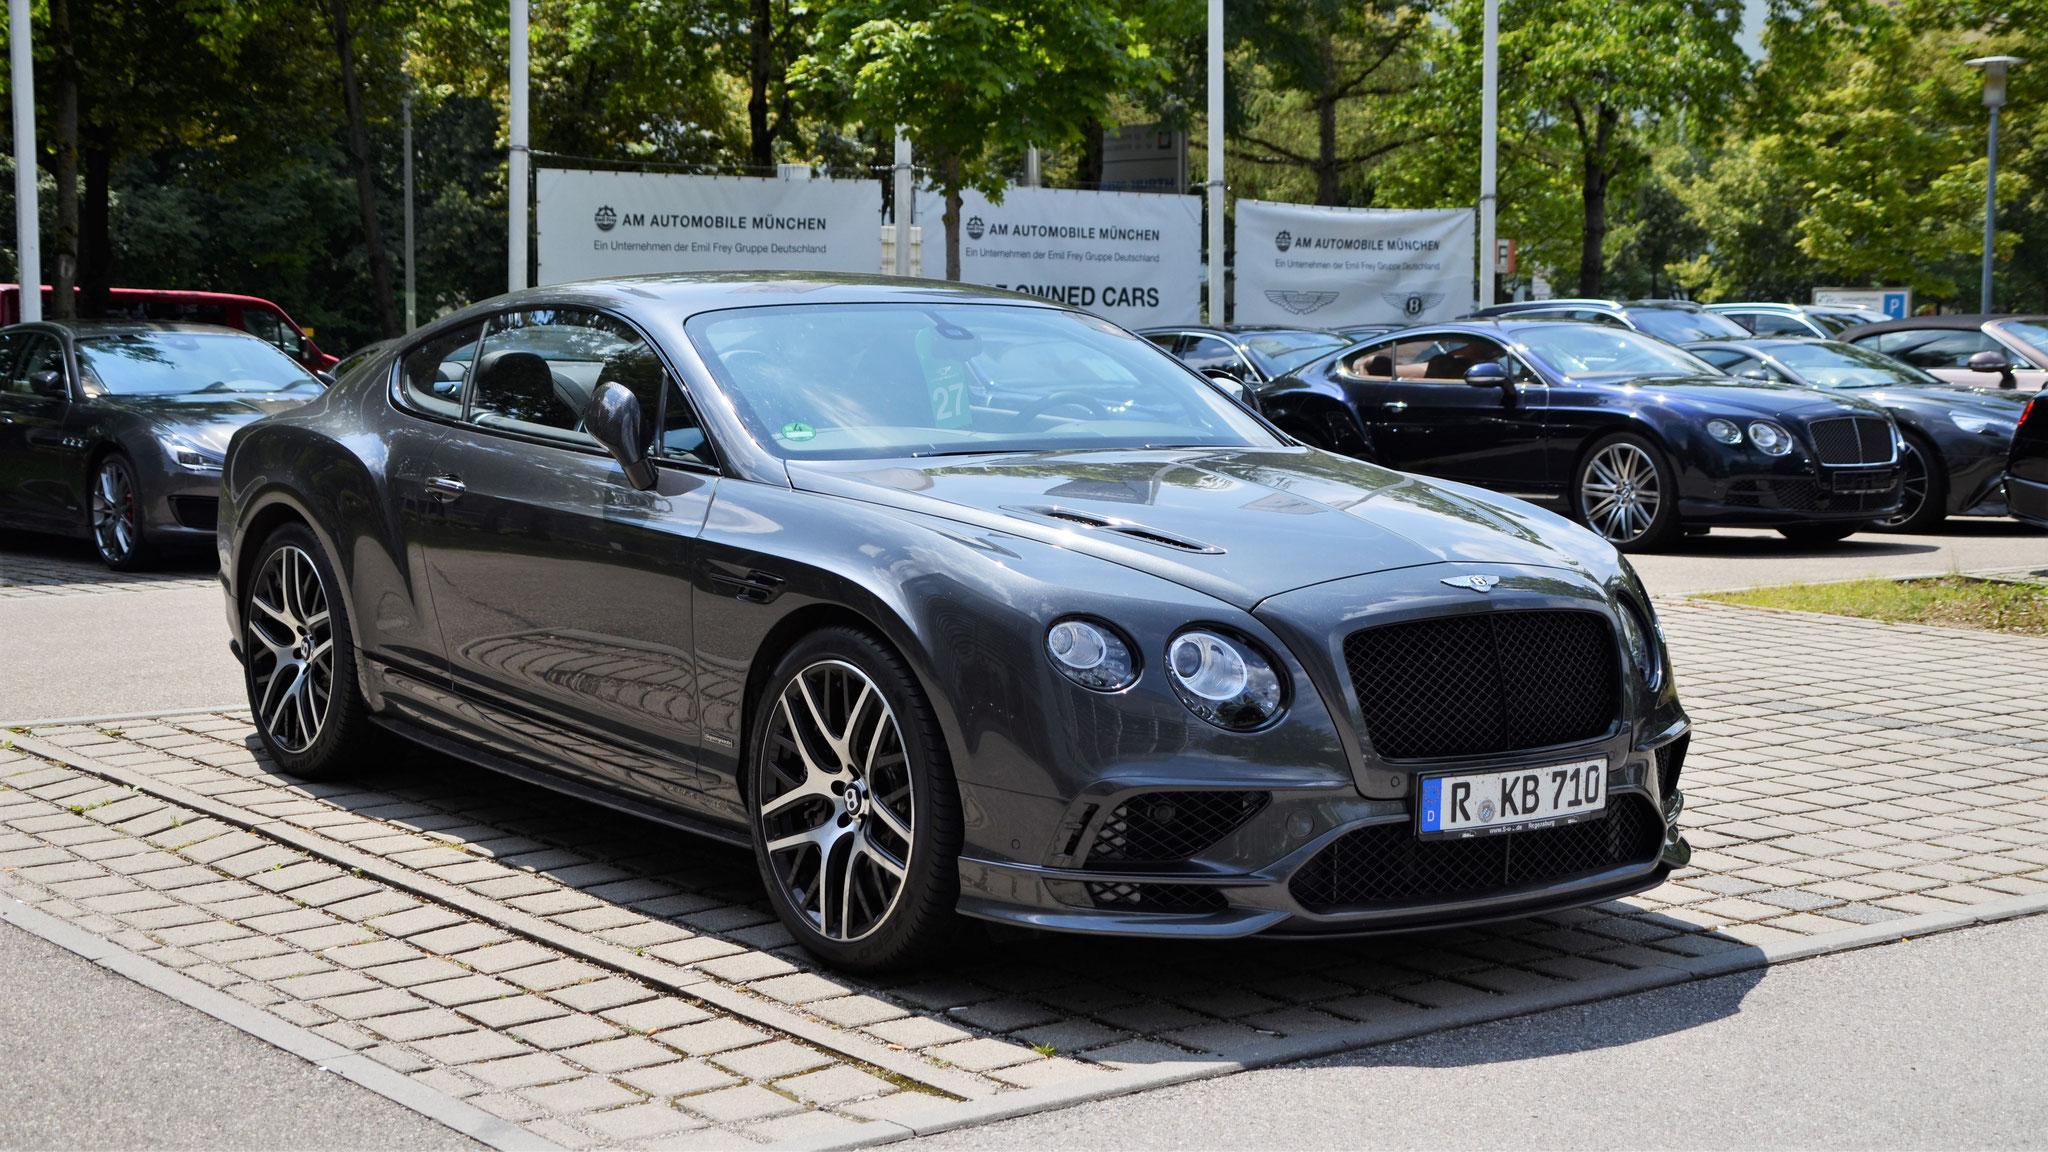 Bentley Continental GT Supersports - R-KB-710